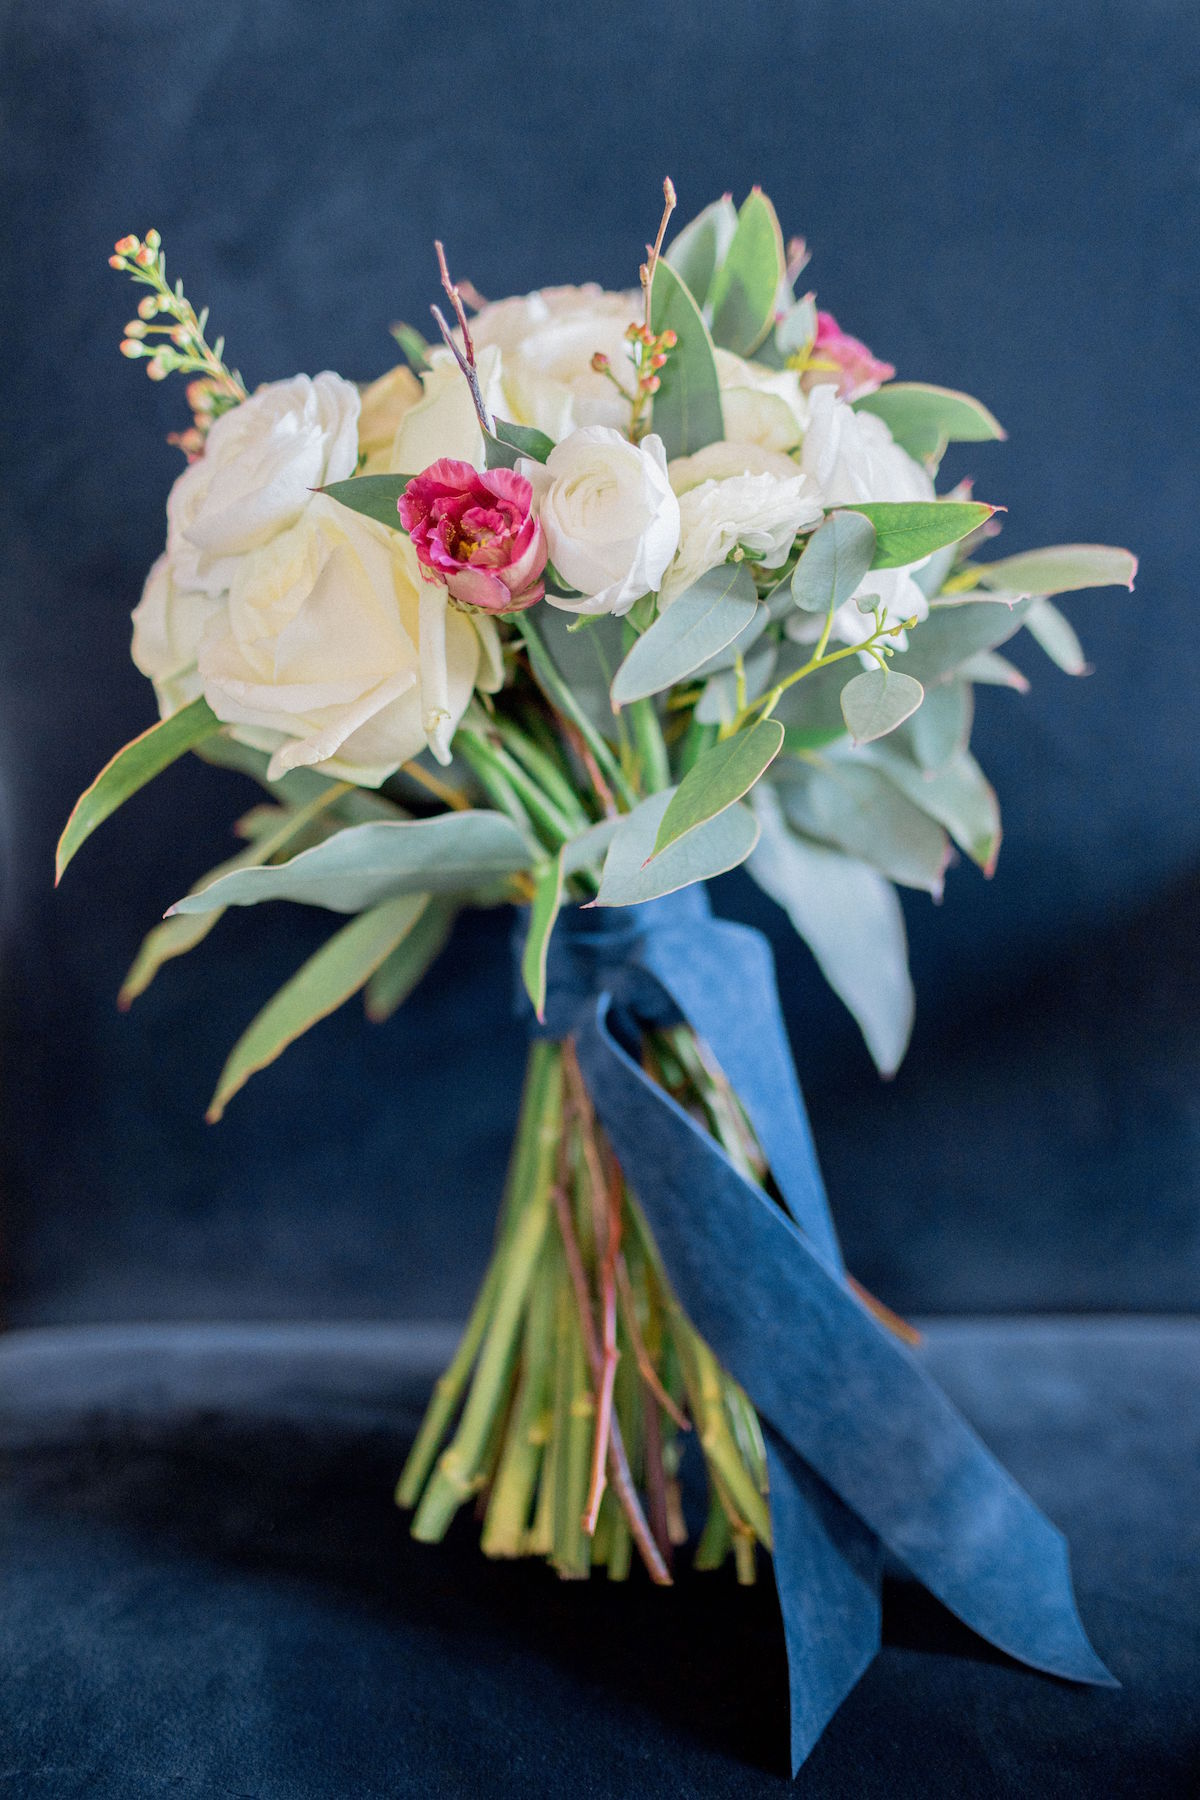 Rose bouquet with blue velvet ribbon